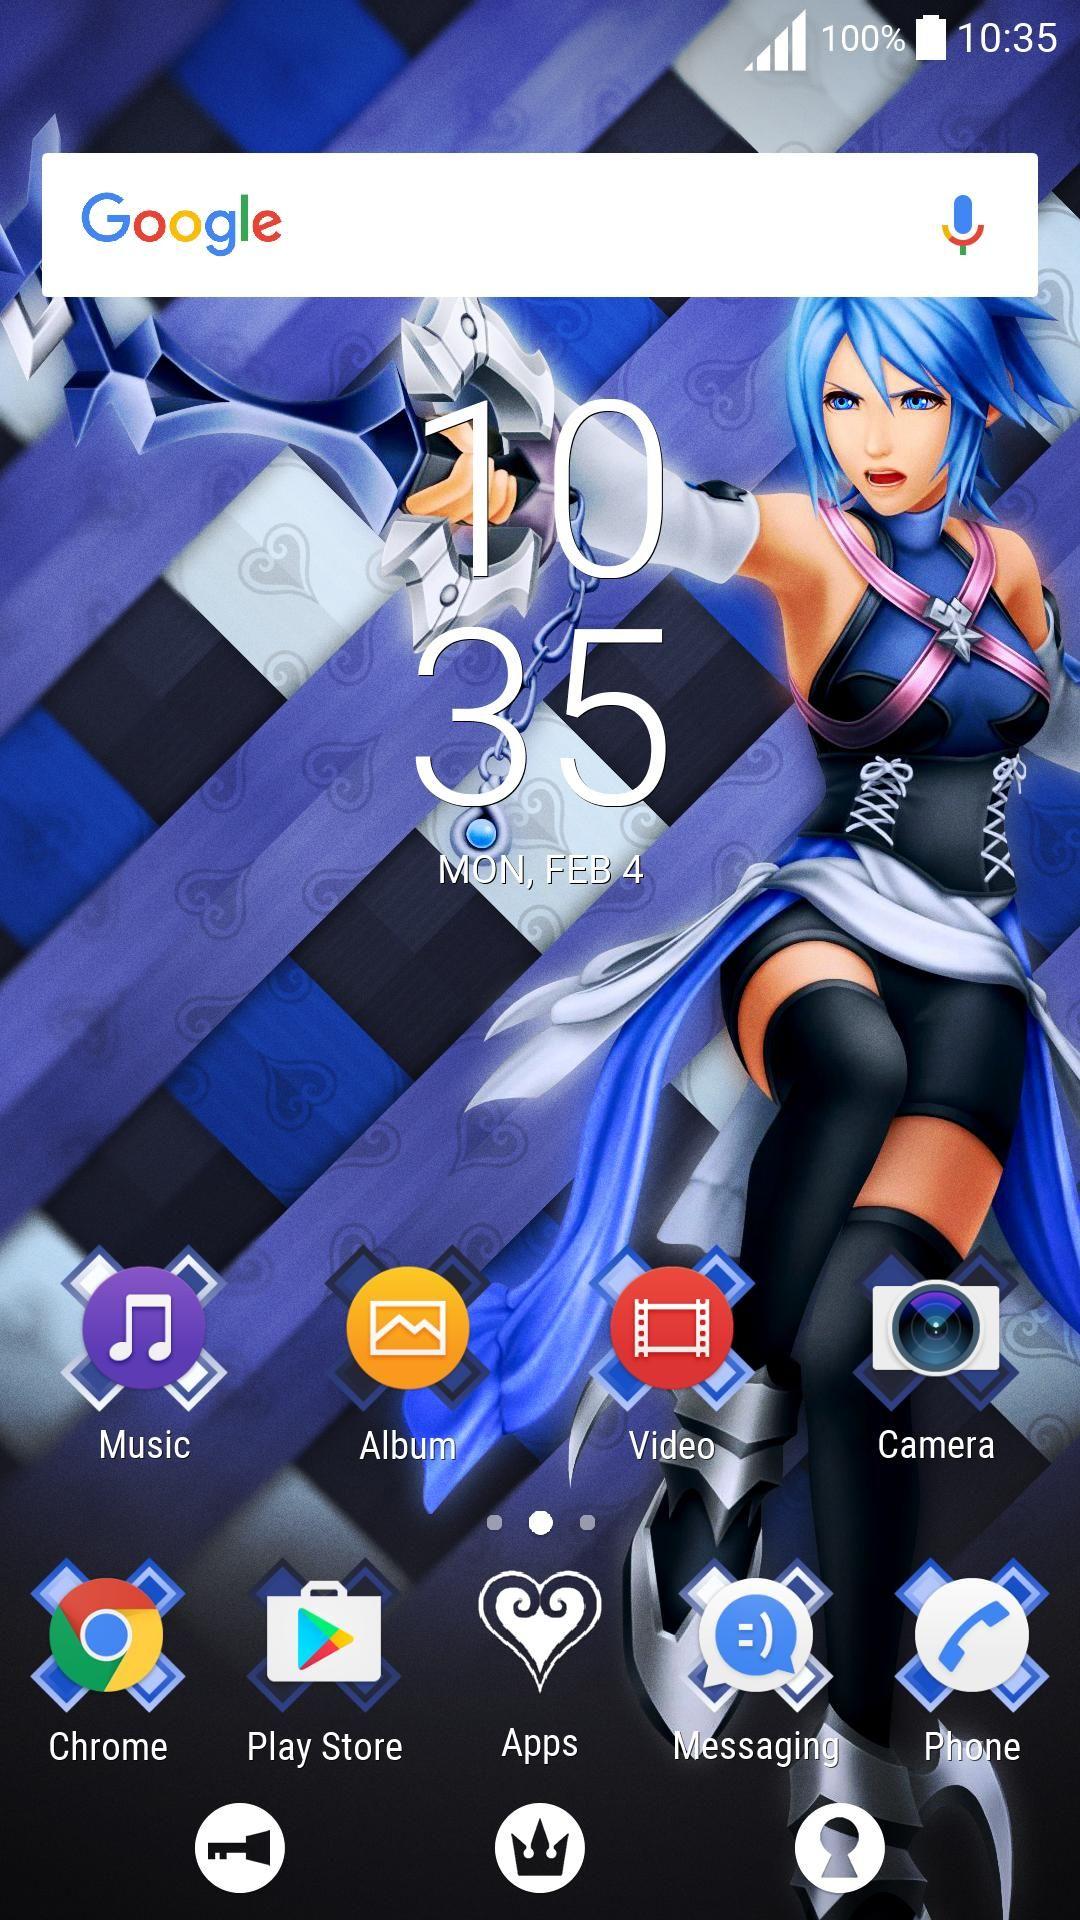 Aqua Kingdom Hearts Wallpaper Iphone in 2020 Kingdom